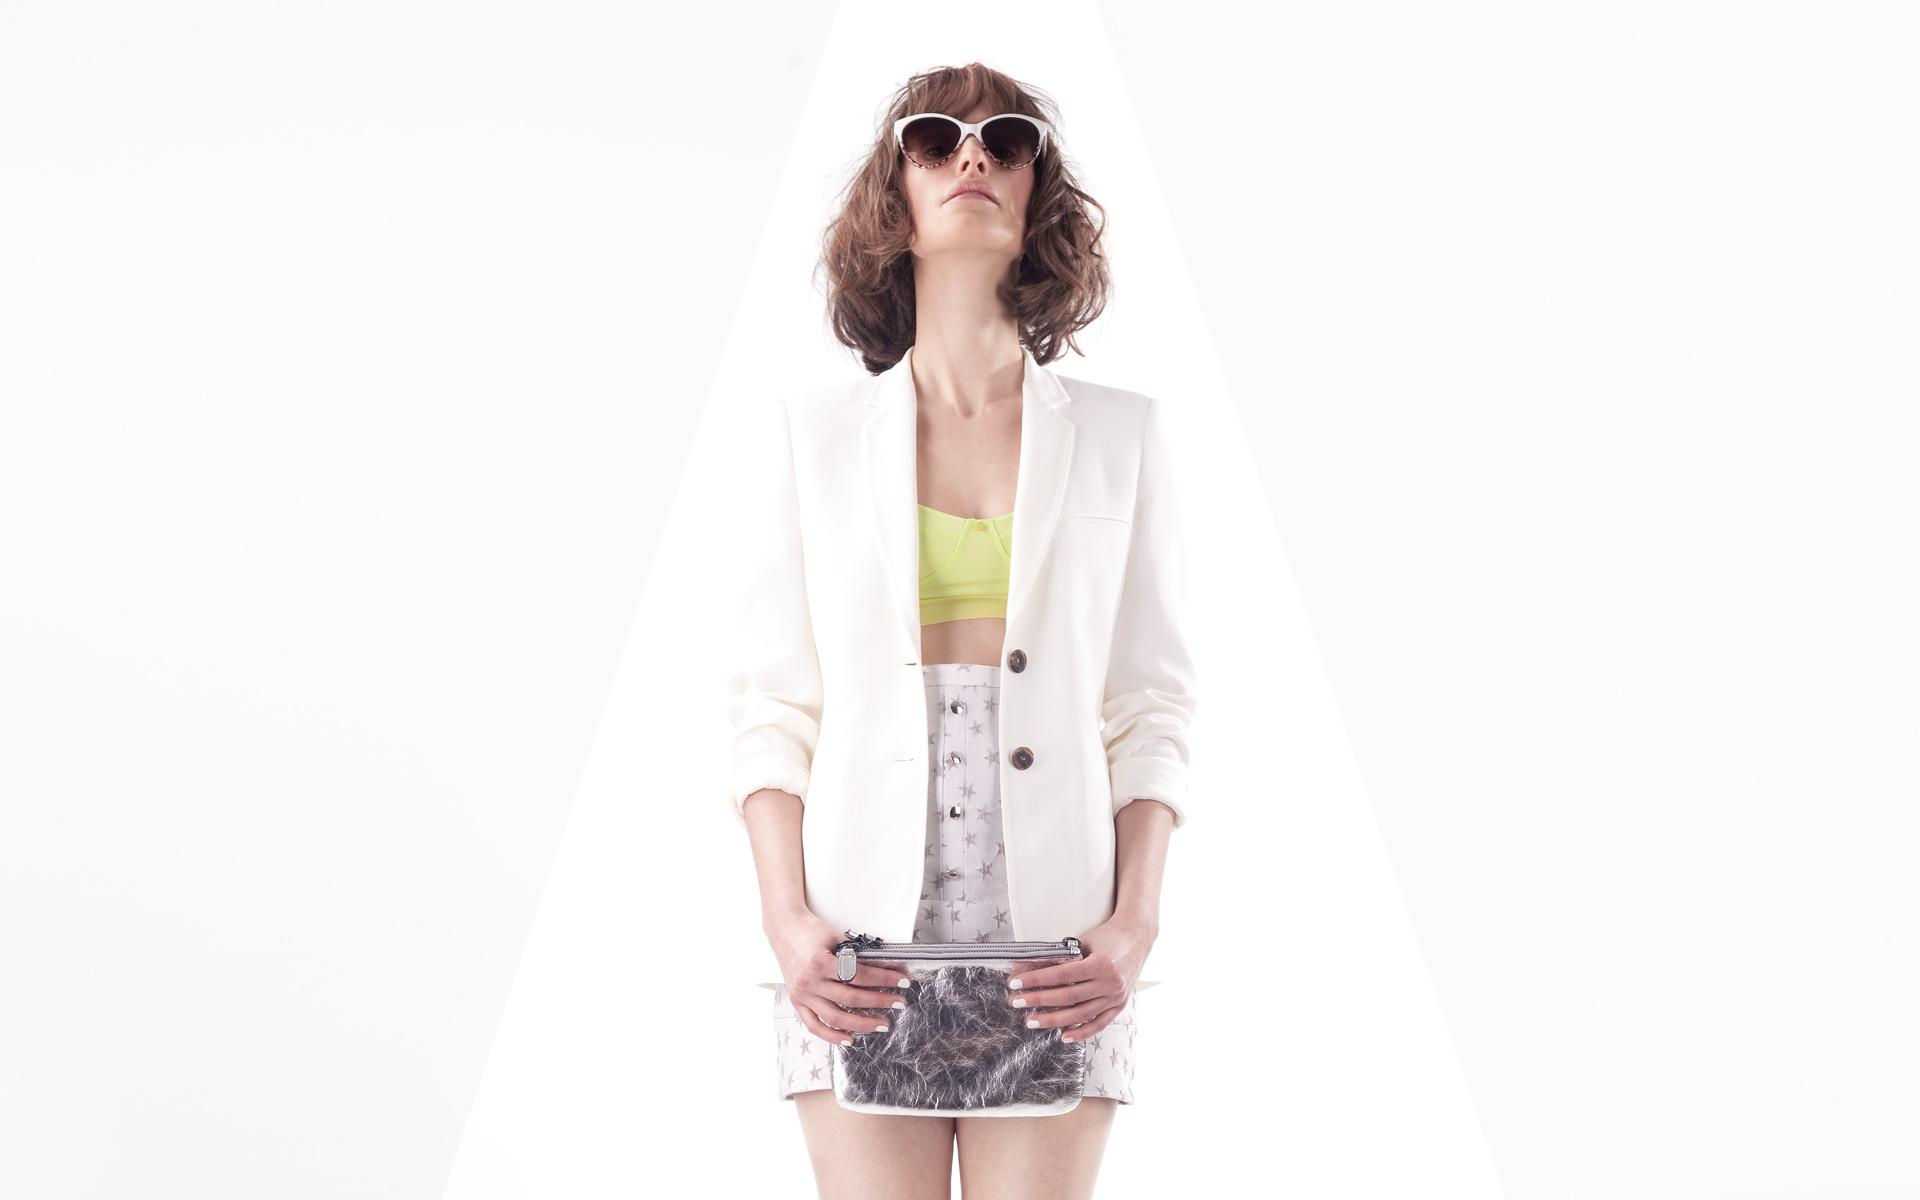 084_Fashion_F.Roncaldier